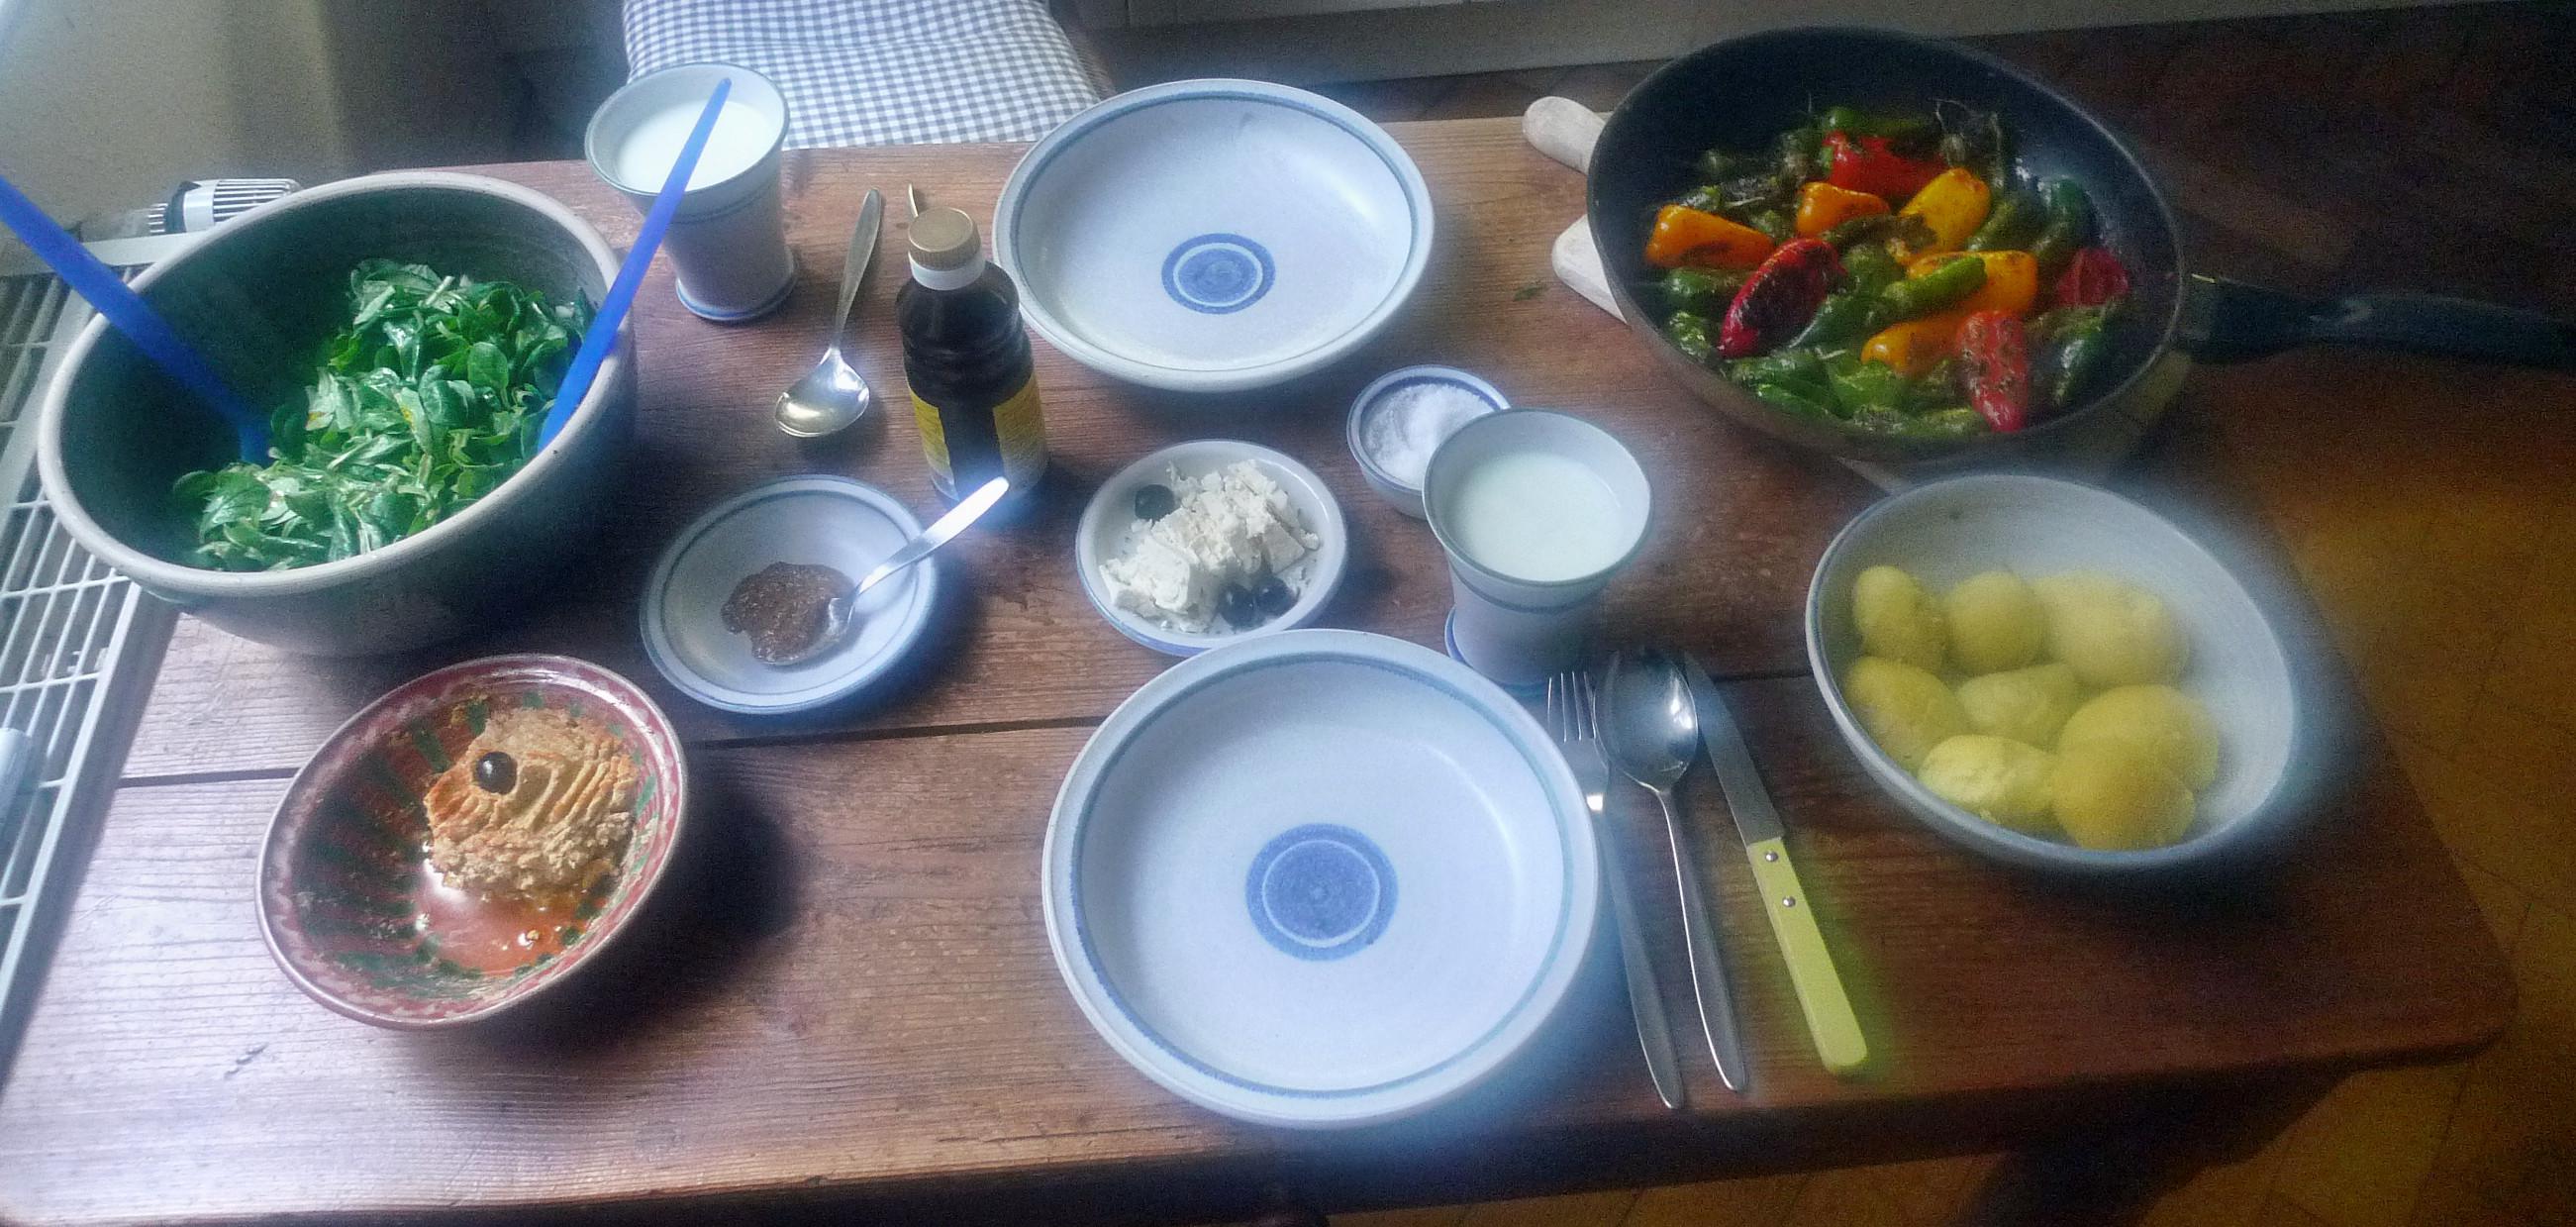 Pimentos-Paprika-Kartoffel-Salat-Buttermilch- 28.9.14   (10)